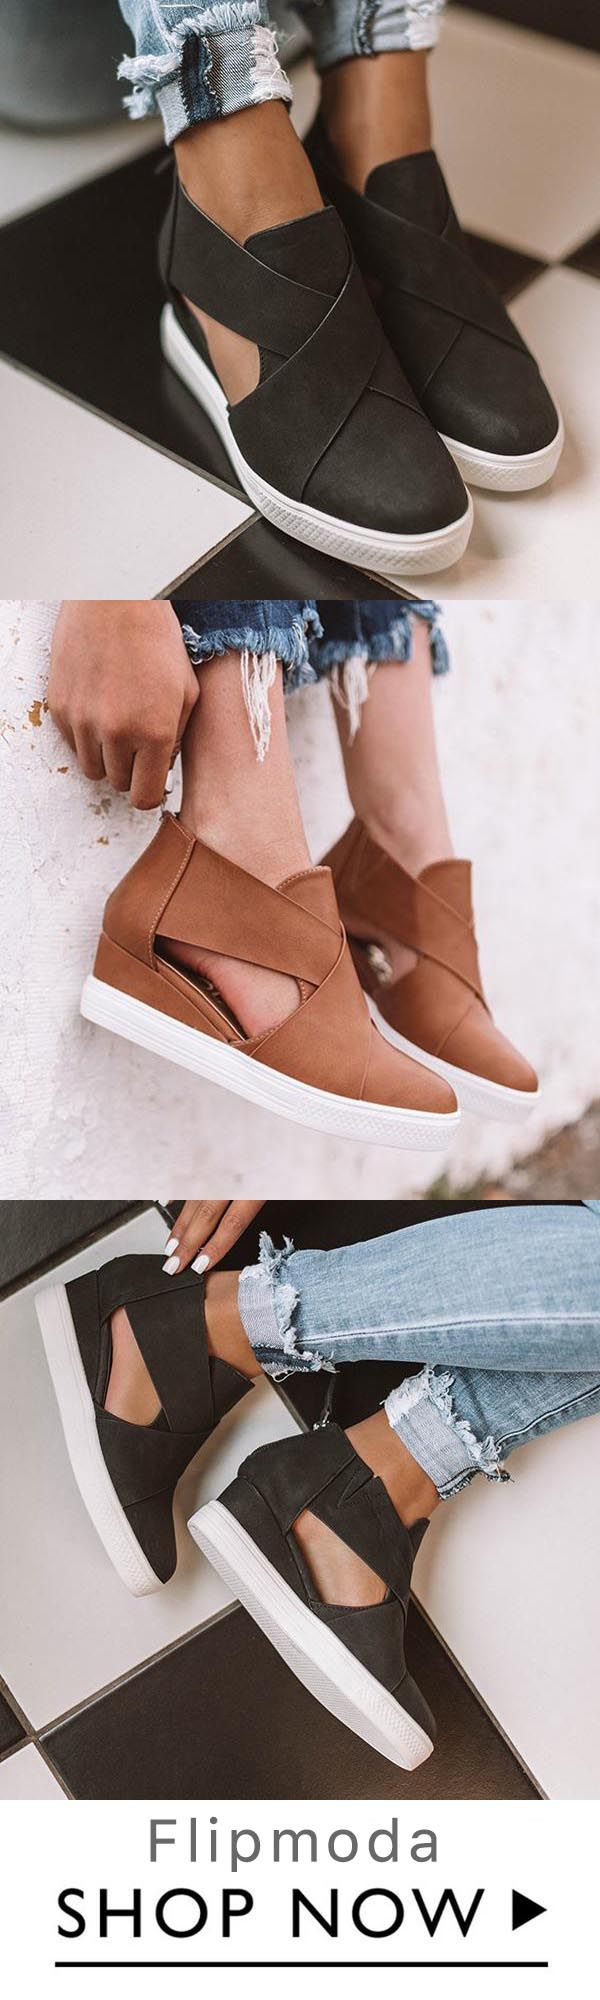 Women Fashion Stylish Wedge Sneakers